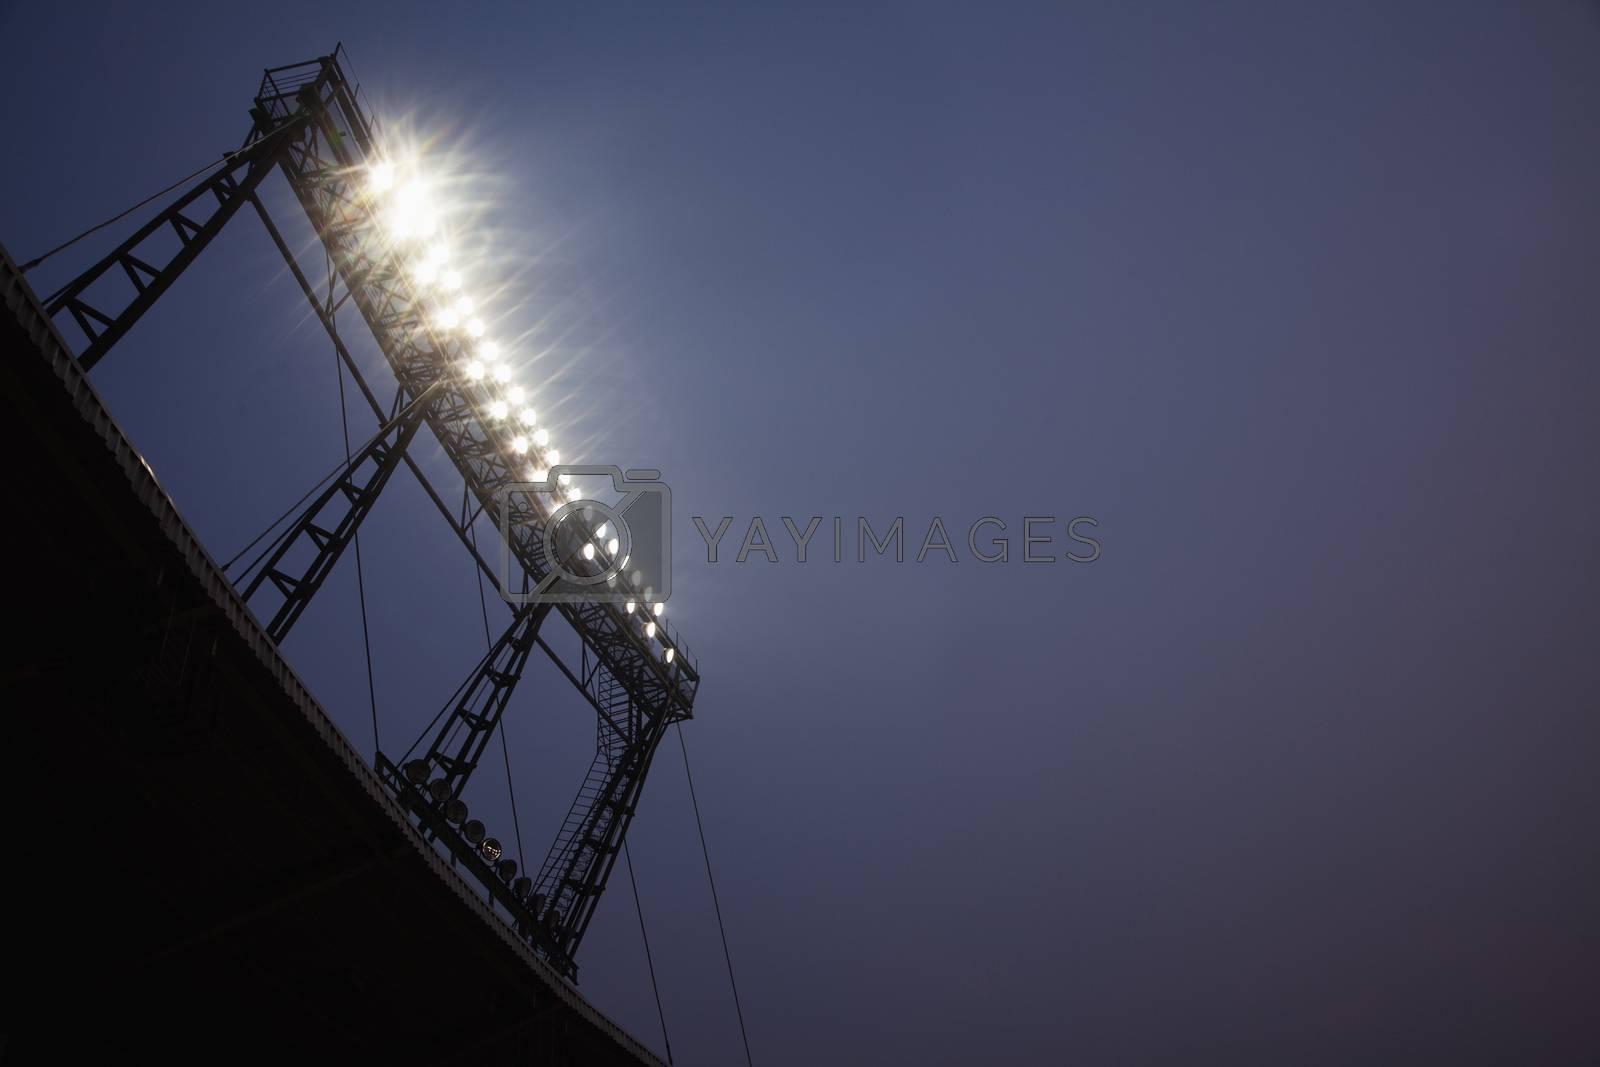 Stadium floodlights at night time, Beijing, China by XiXinXing